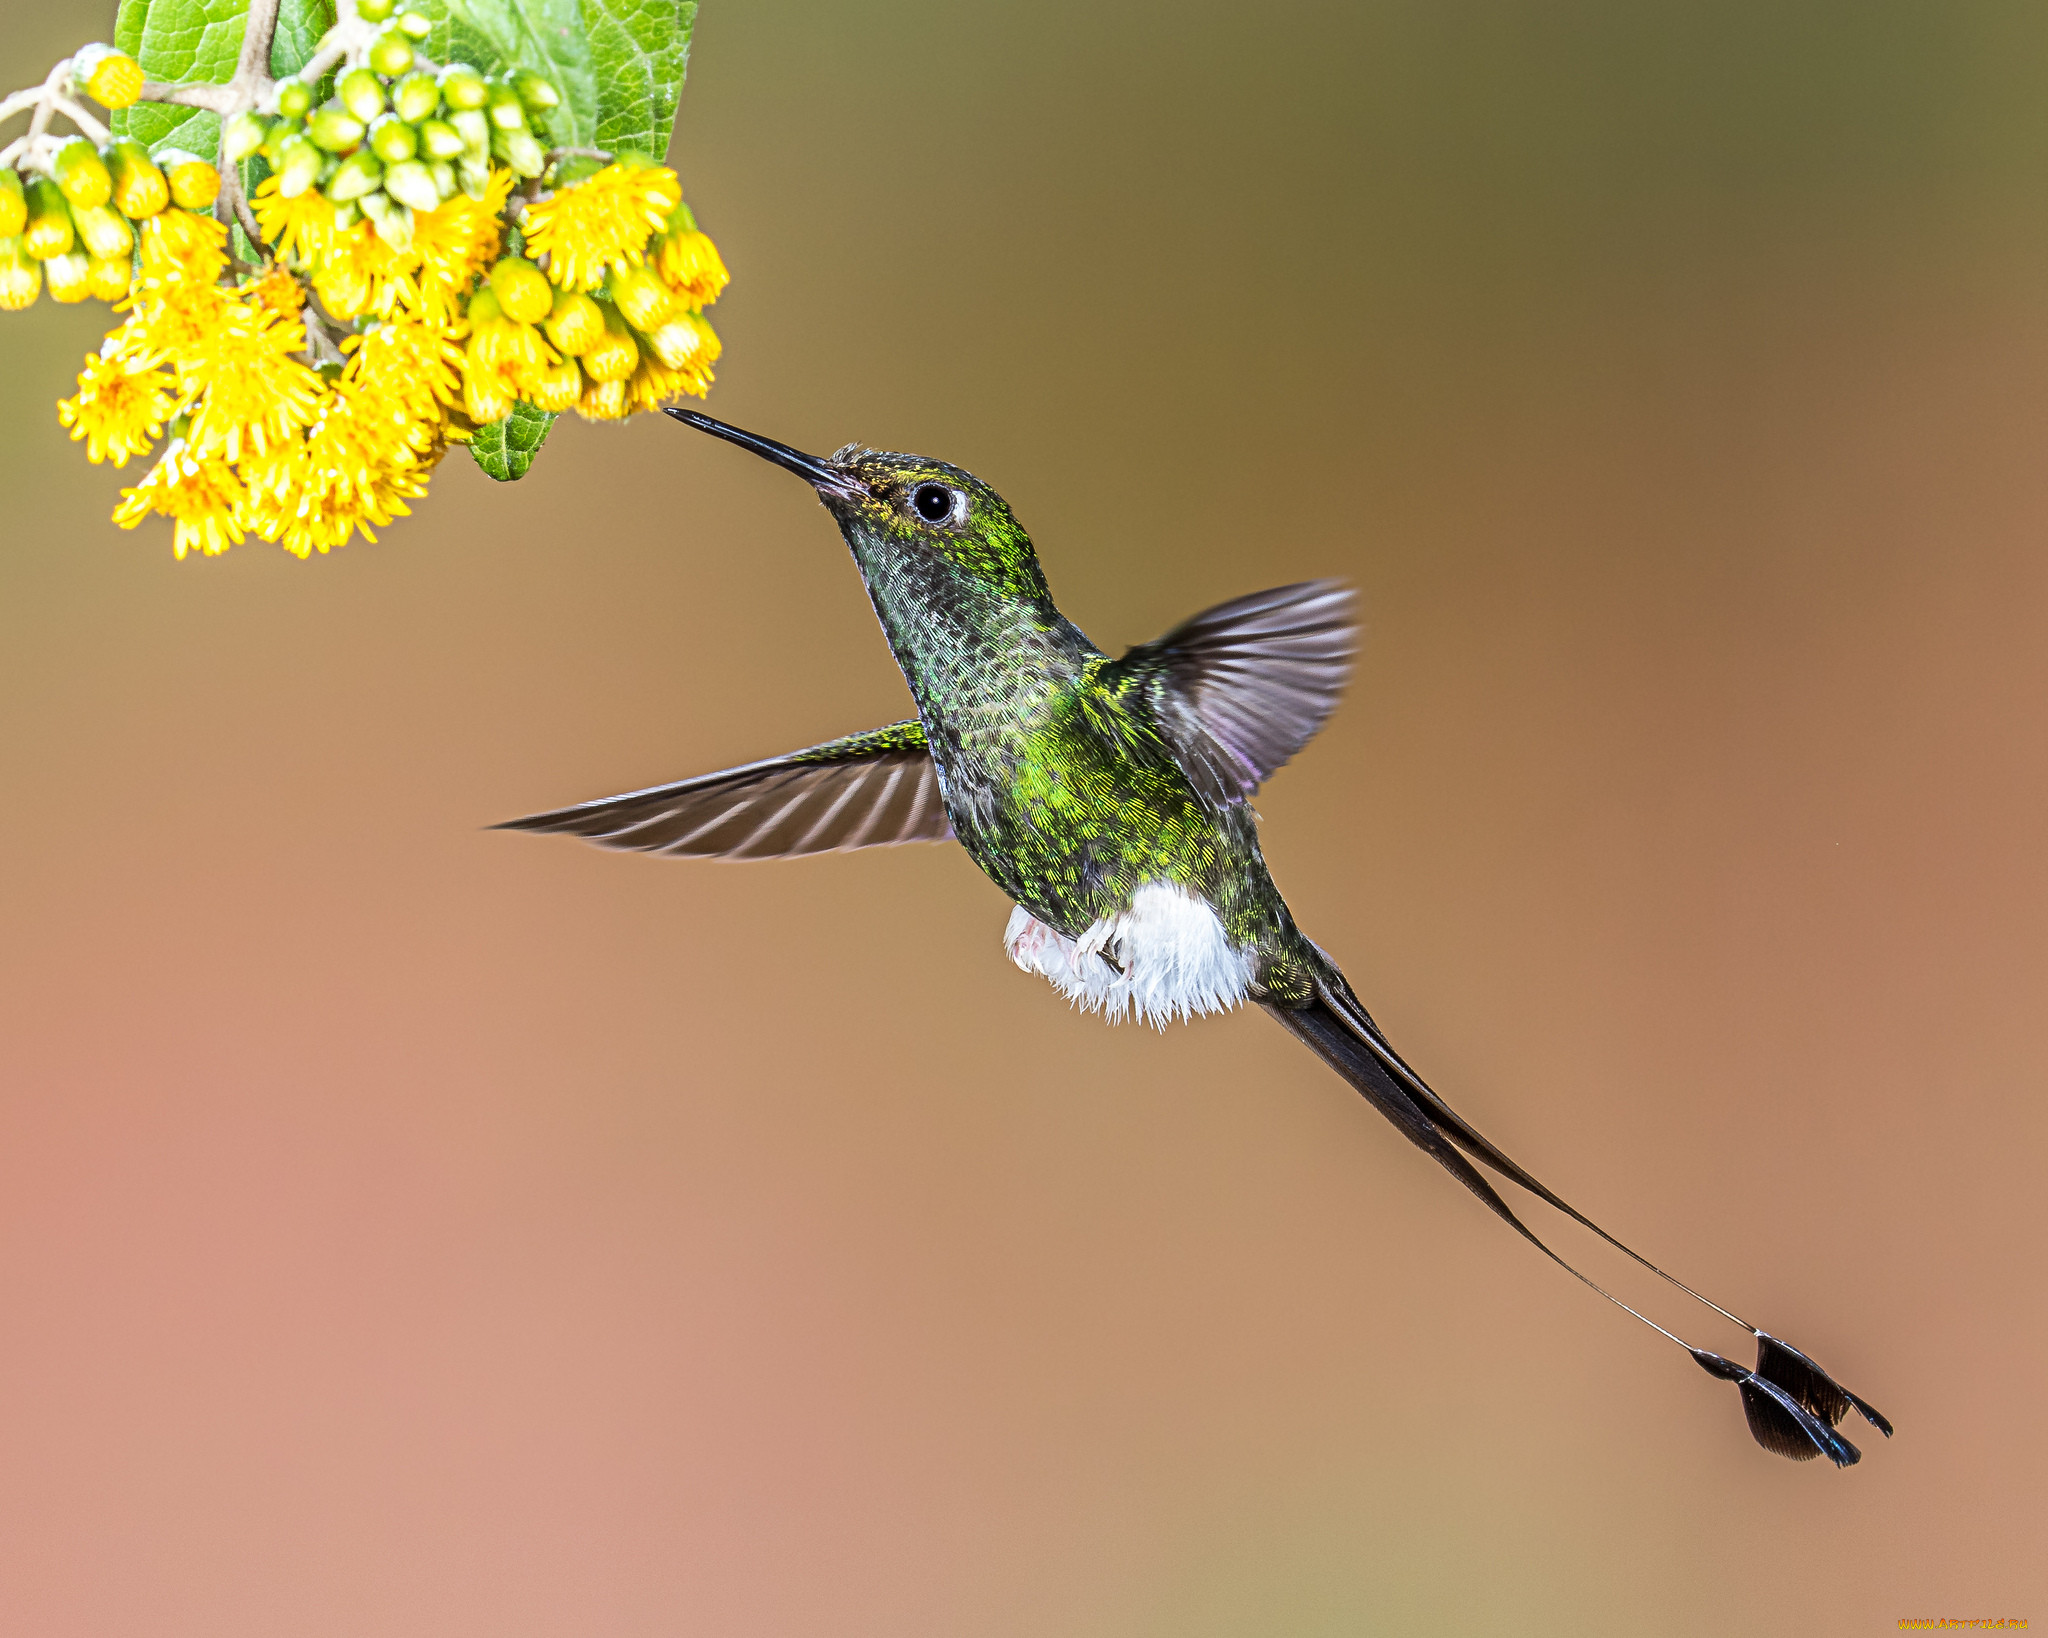 консервативное картинки с птичками колибри существо, ведущее